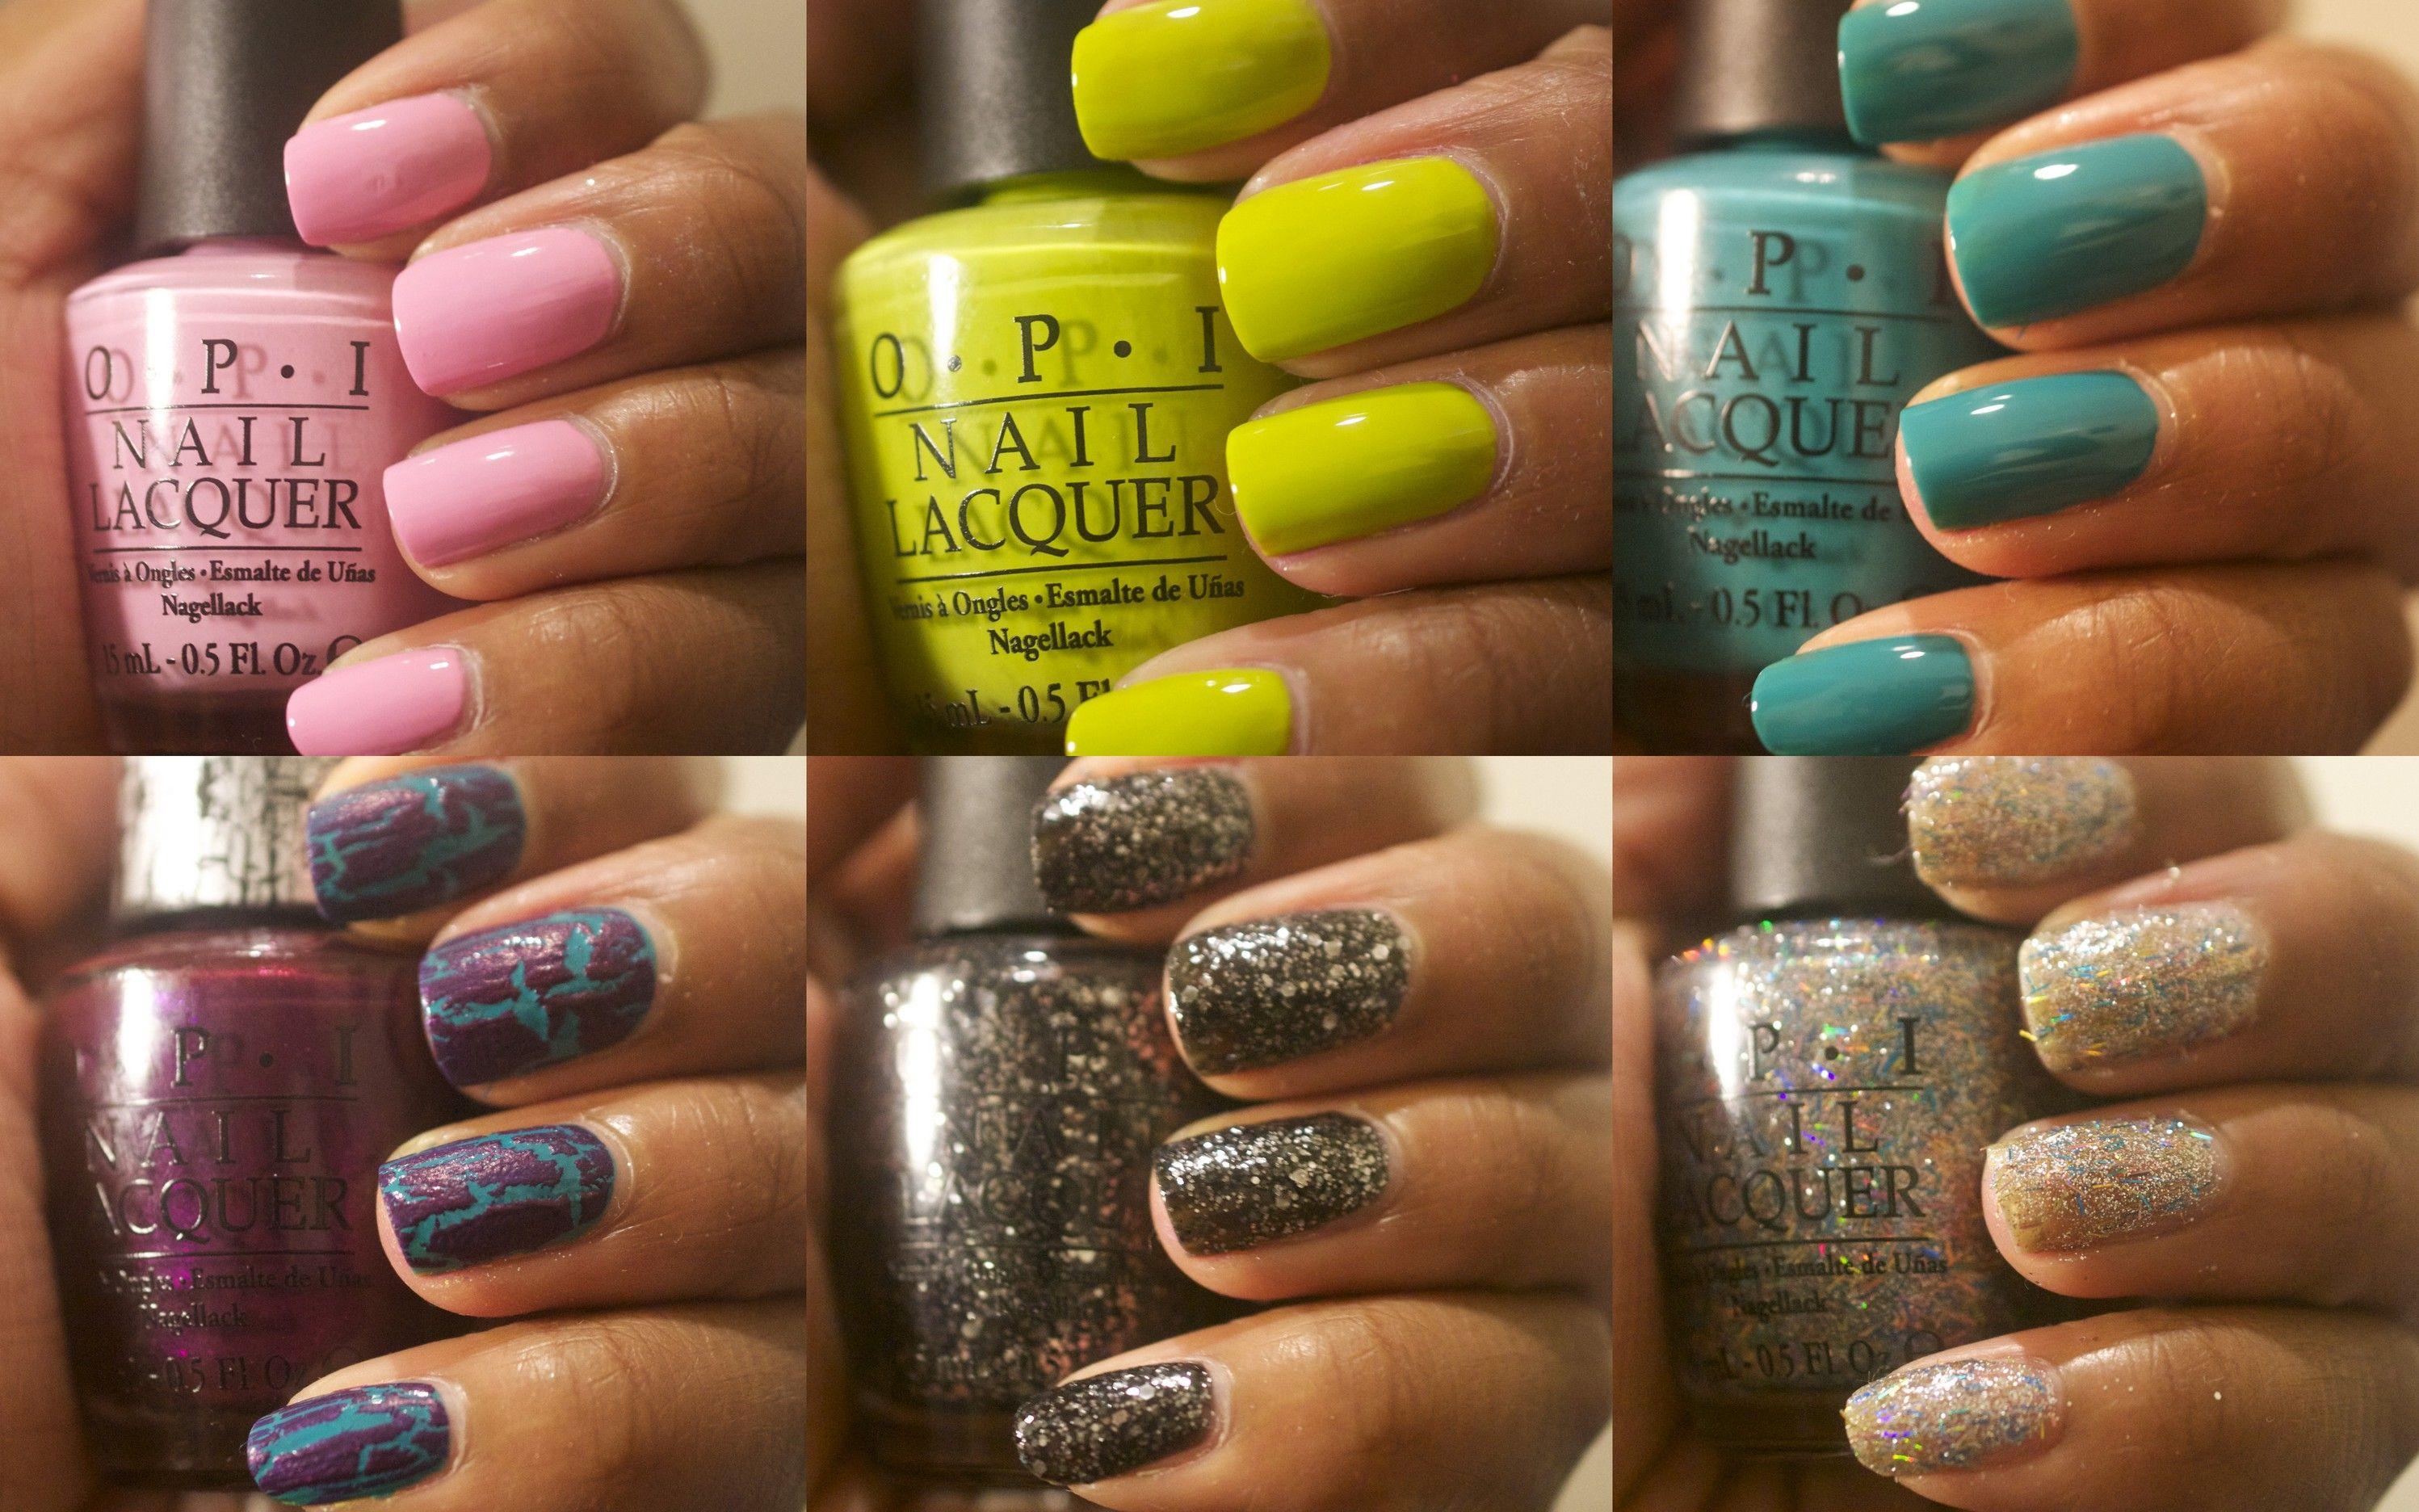 OPI Nicki Minaj nail polish collection | Products I Love | Pinterest ...